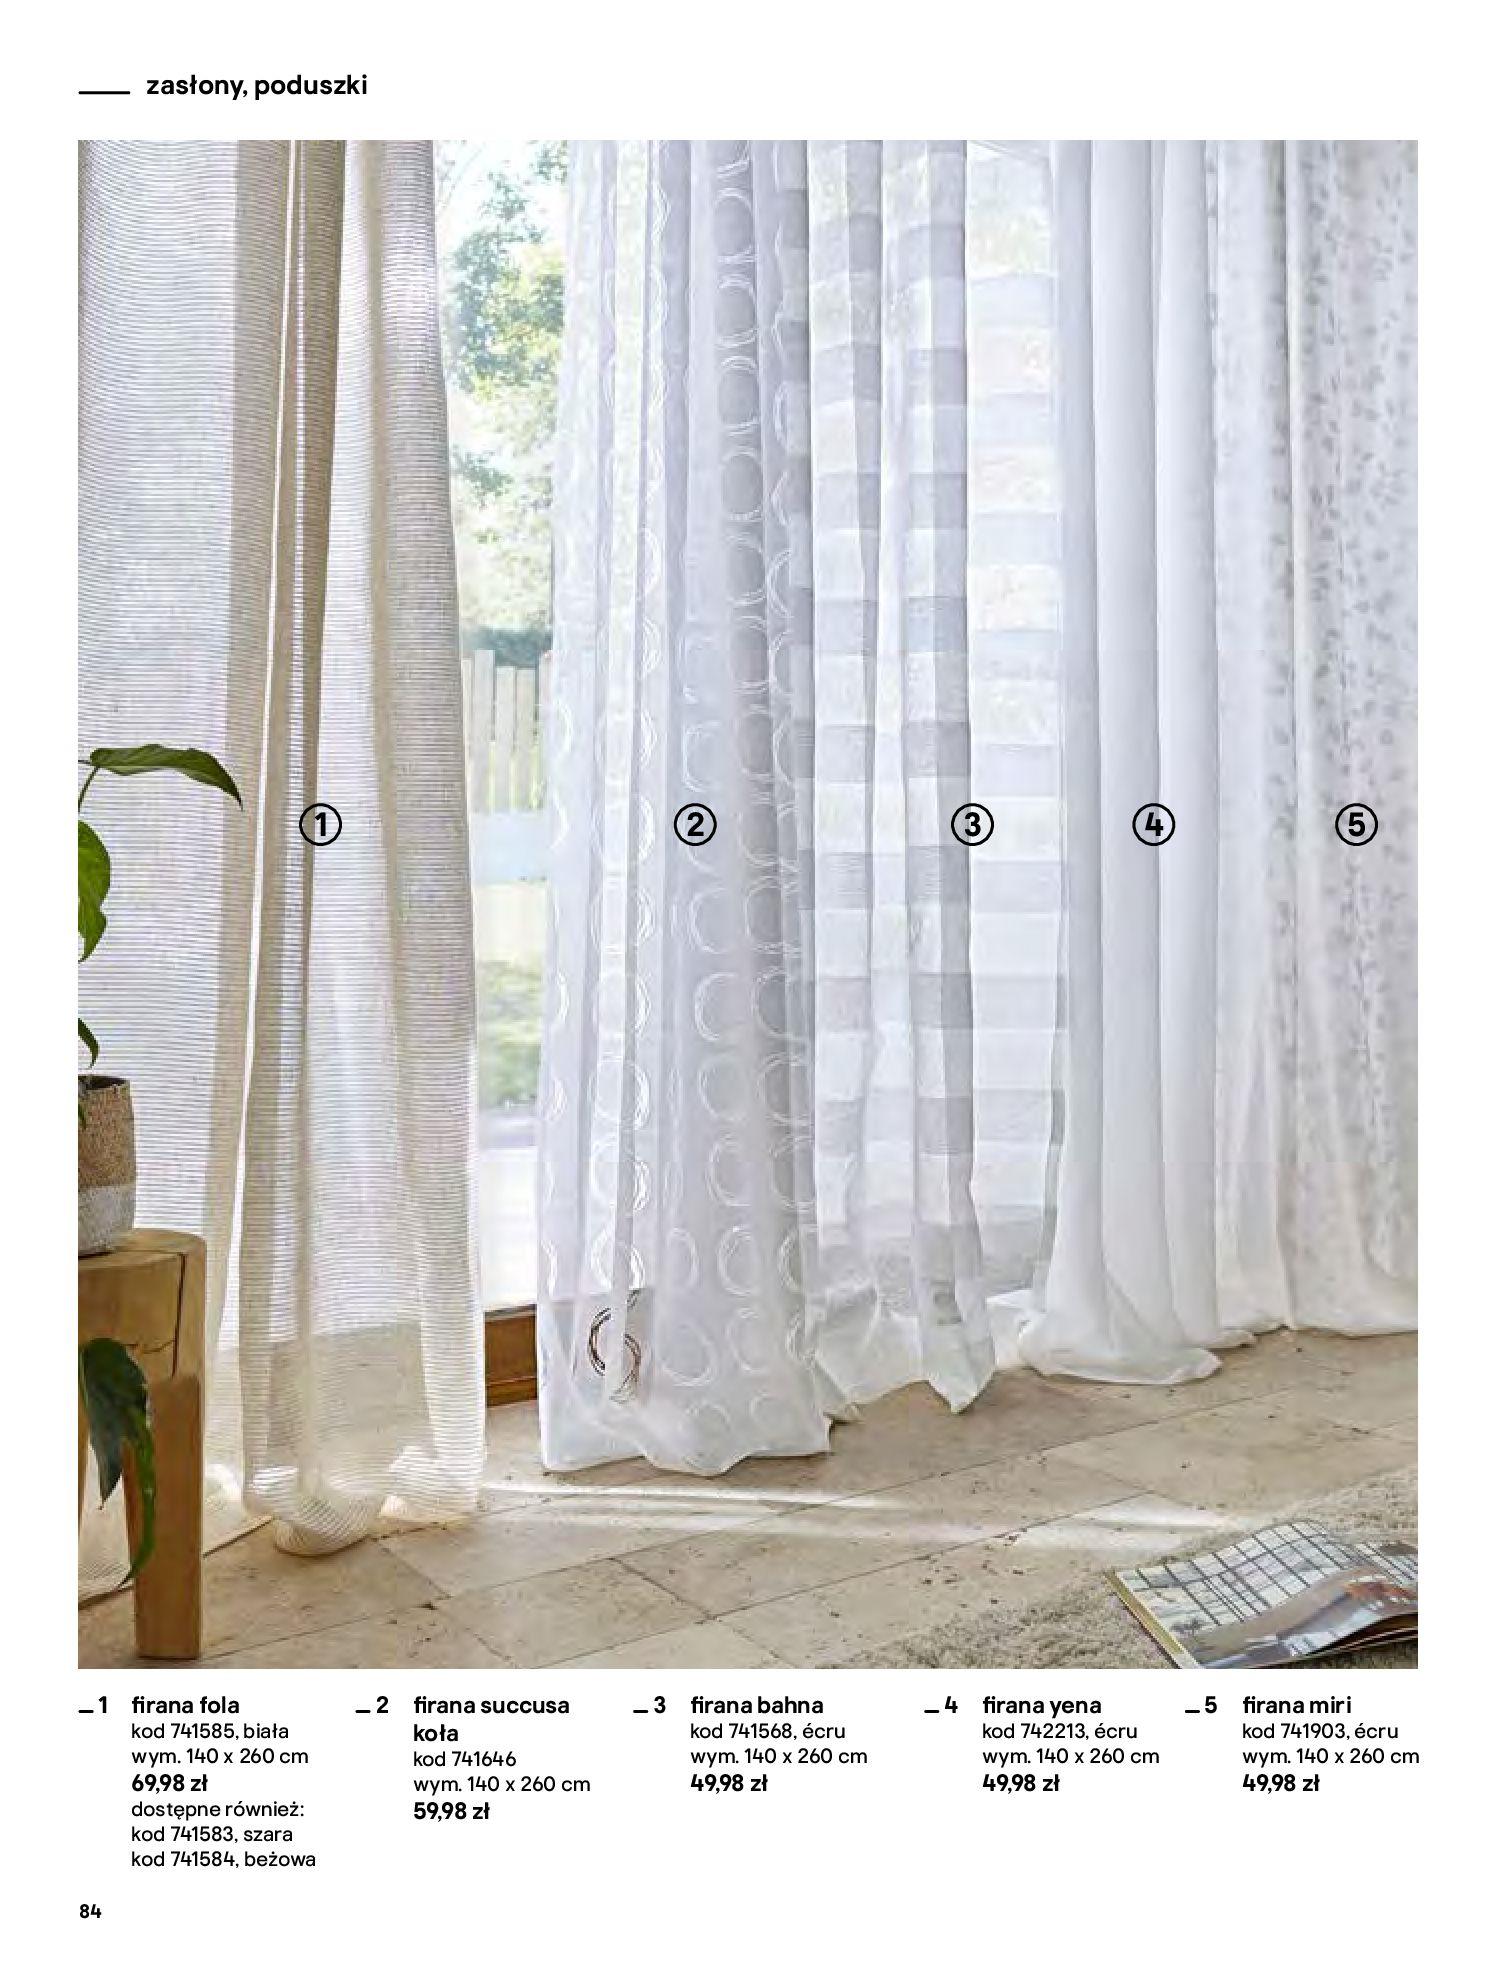 Gazetka Castorama - Katalog Dekoracje-22.10.2020-31.12.2020-page-84